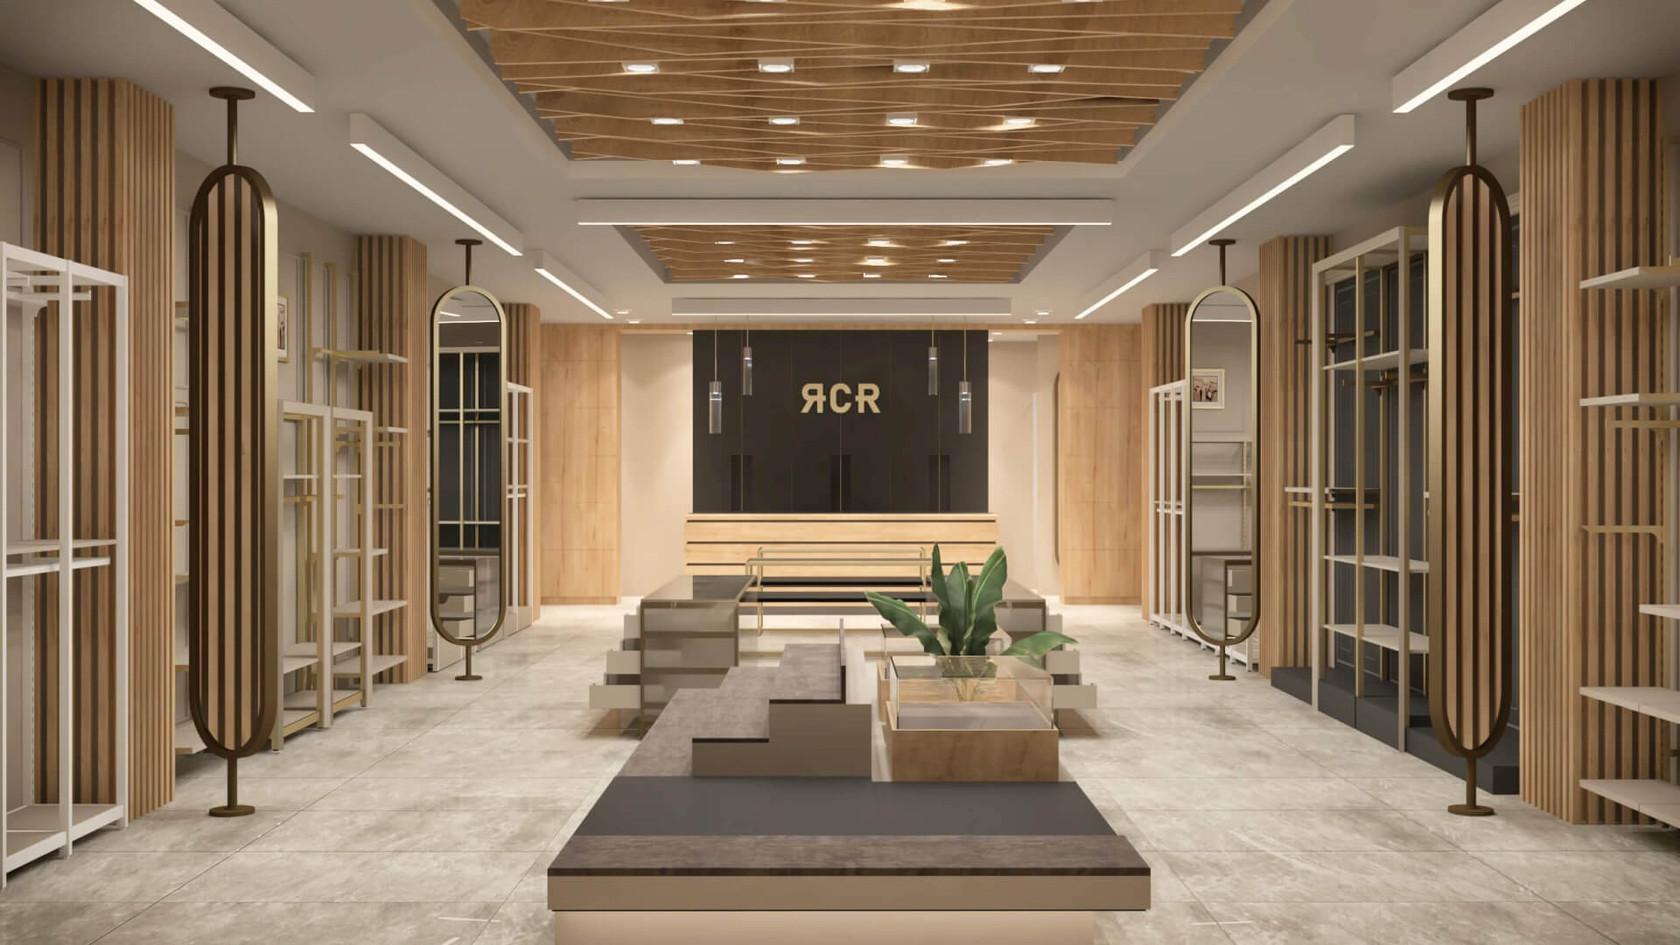 RCR - Fashion Store Shop Design